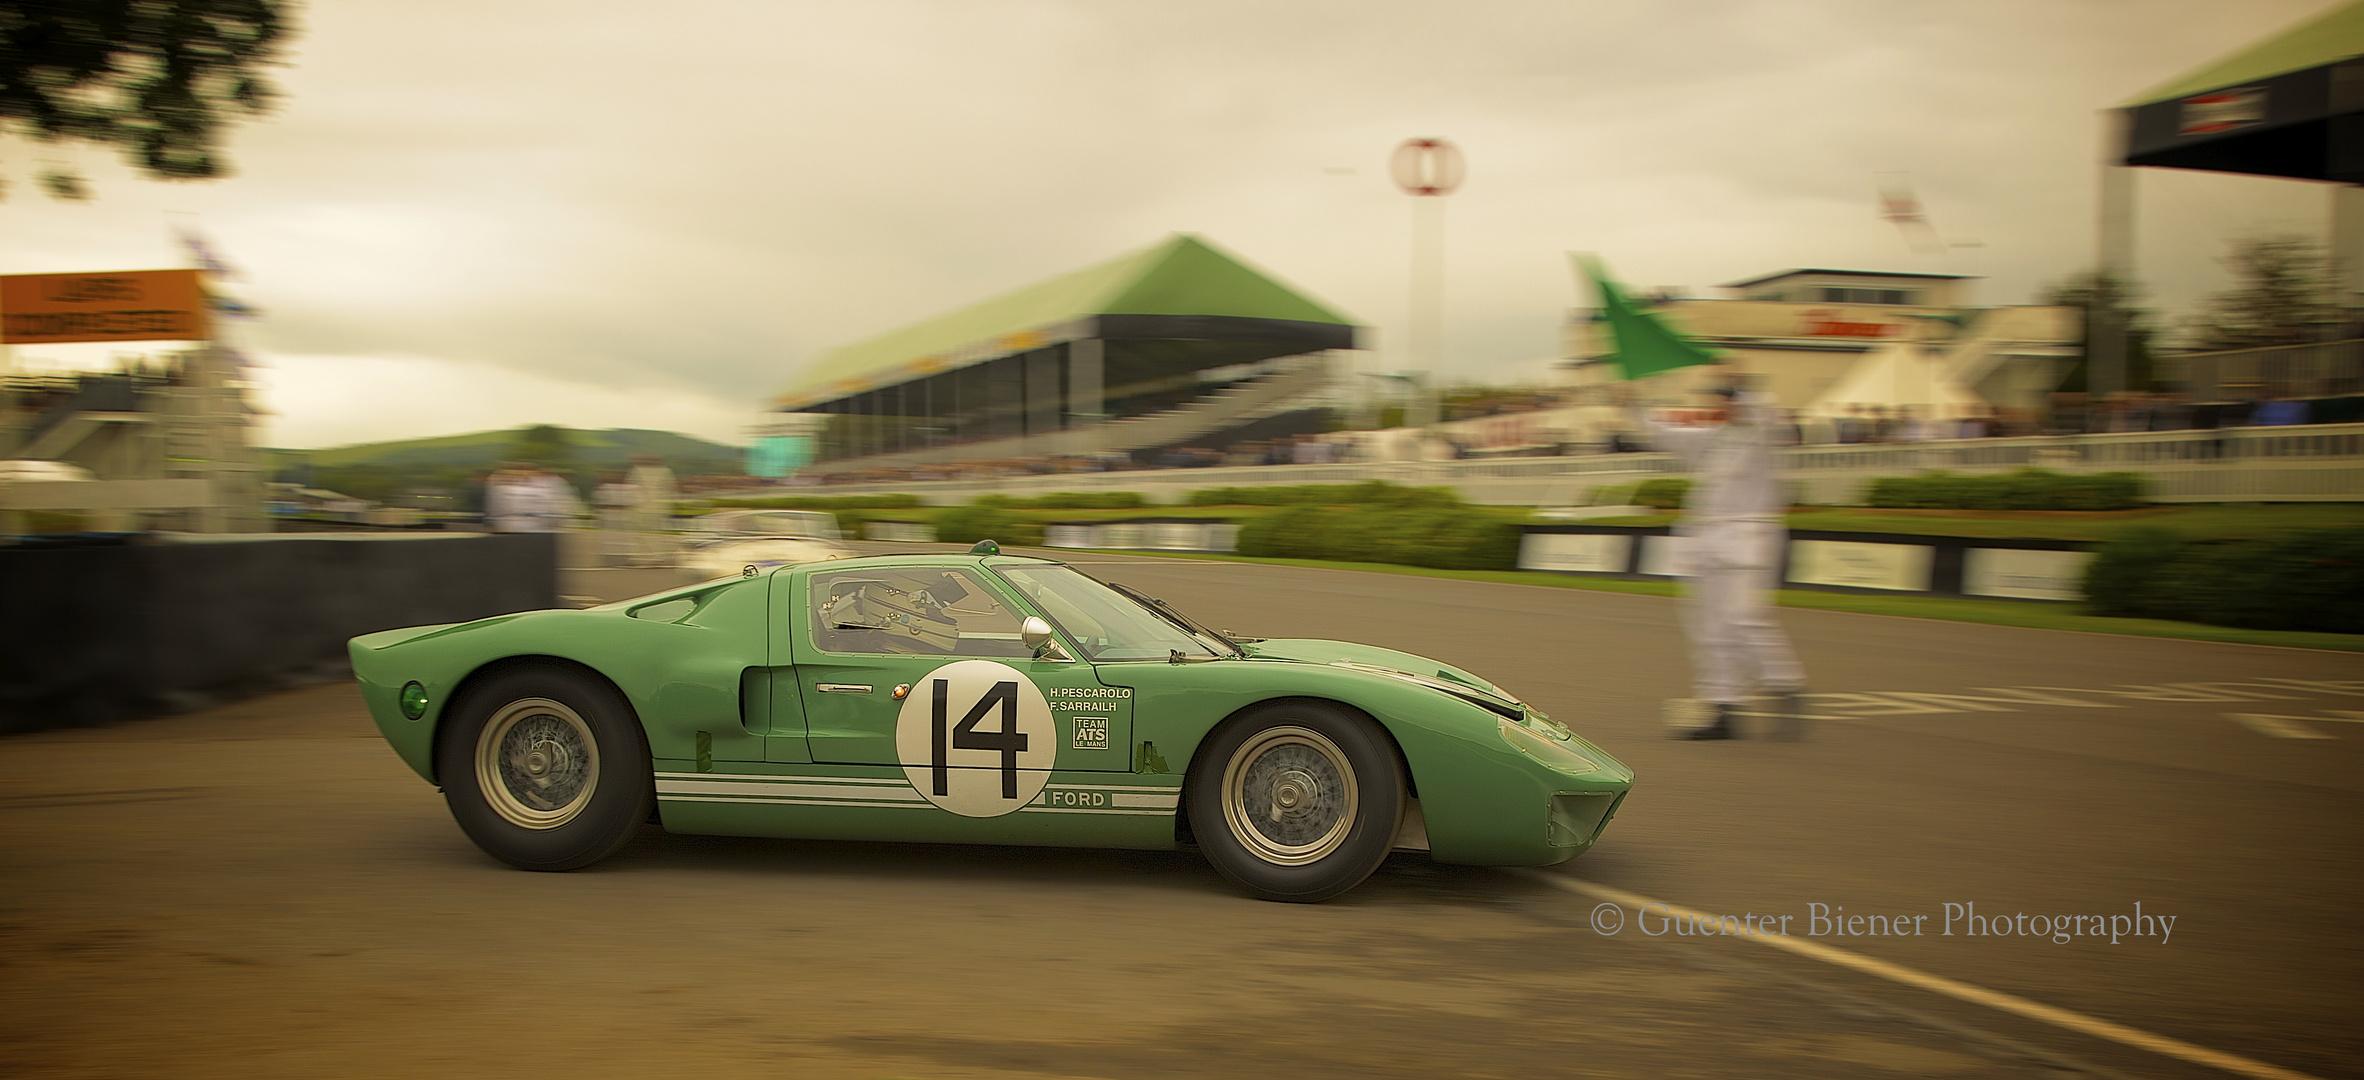 Le Mans Legend Henry Pescarolo......